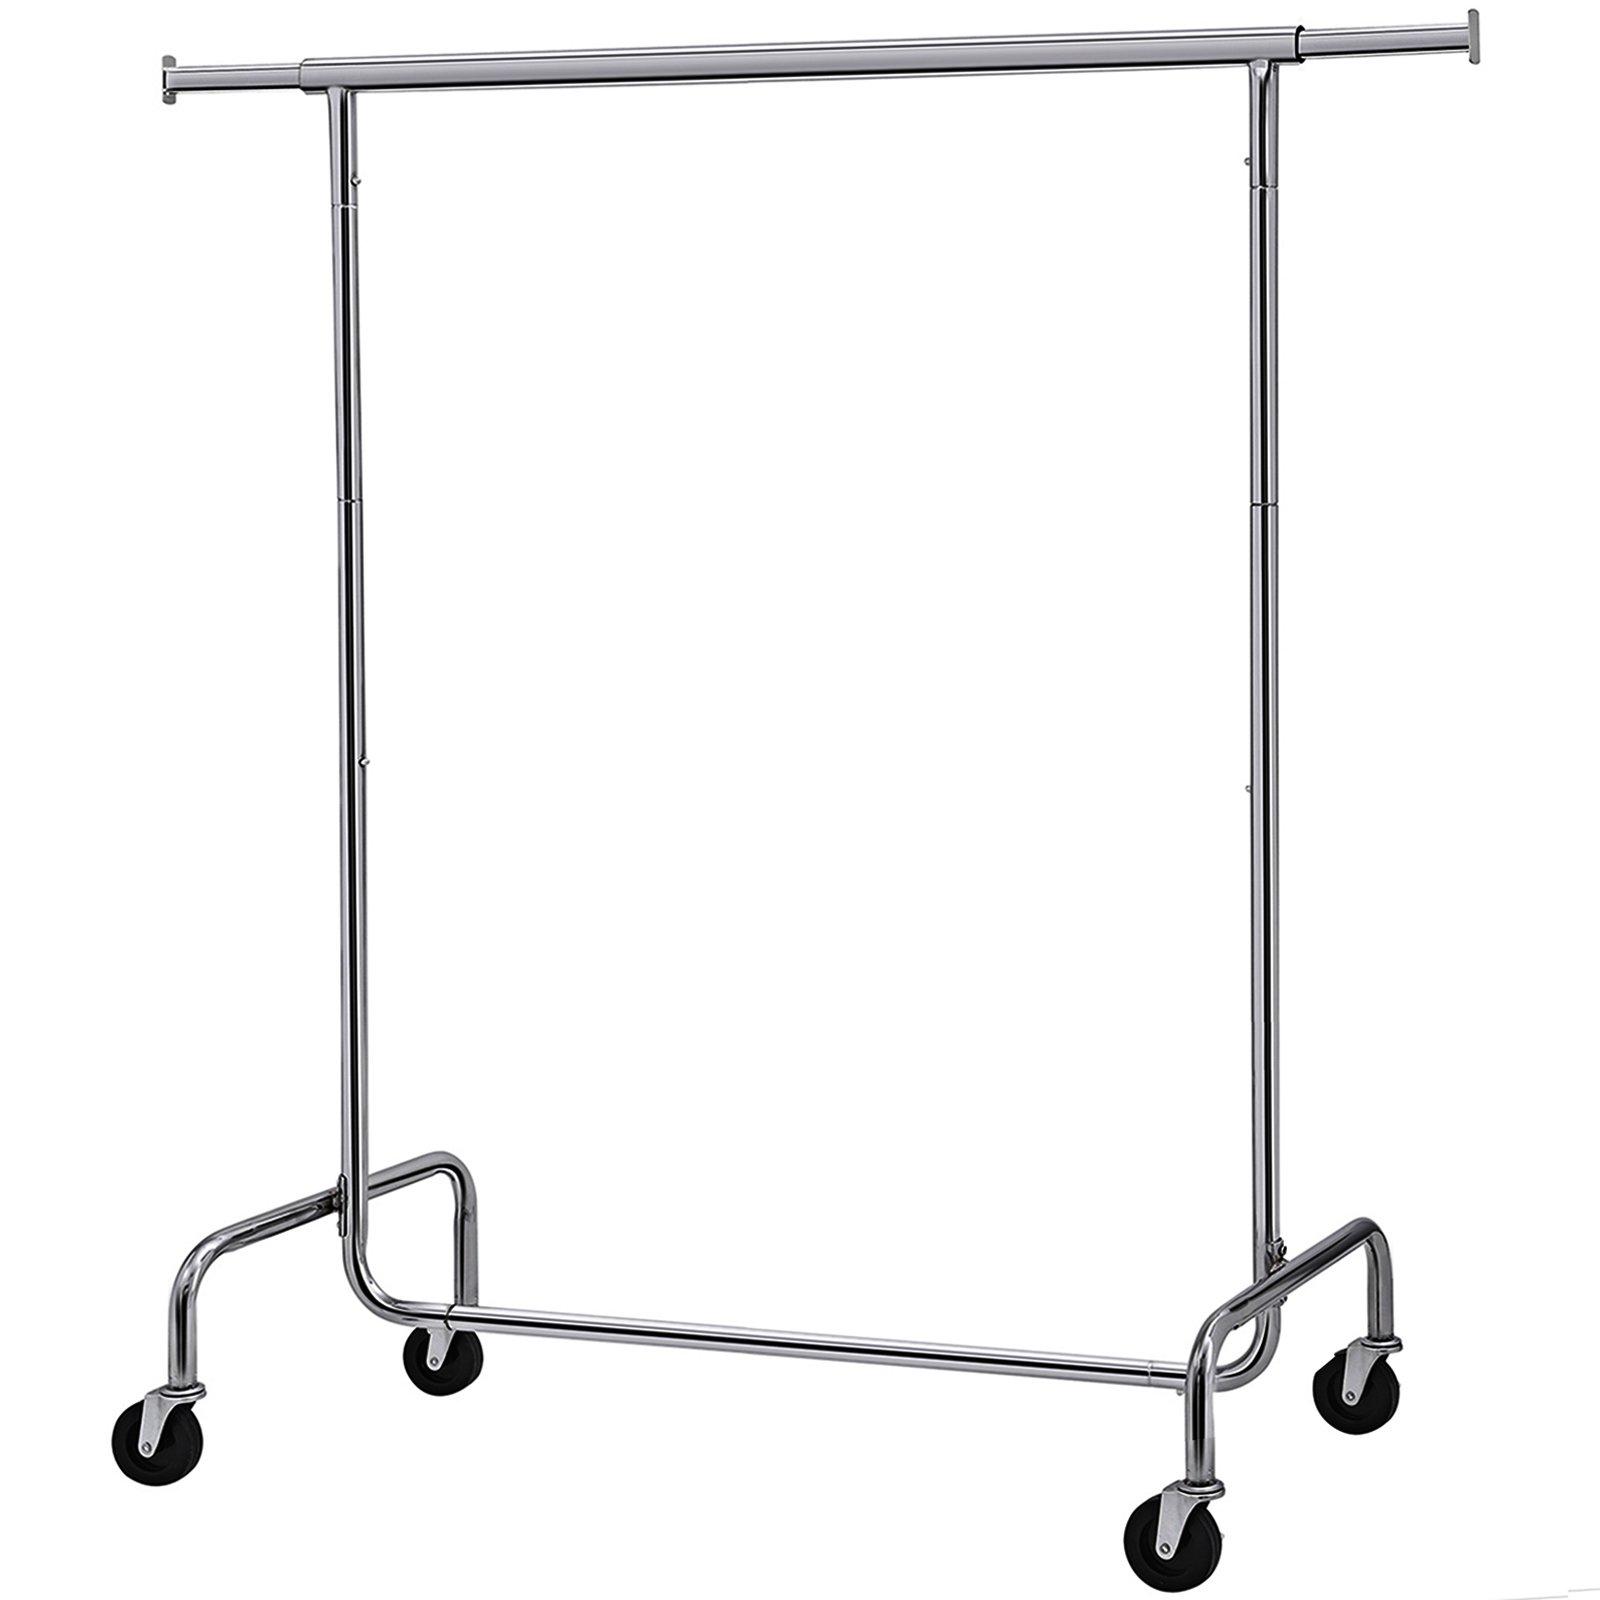 SONGMICS Heavy Duty Clothes Garment Rack Maximum Capacity 286.6lbs Clothing Rack on Wheels All Metal Chrome Extendable UHSR11S